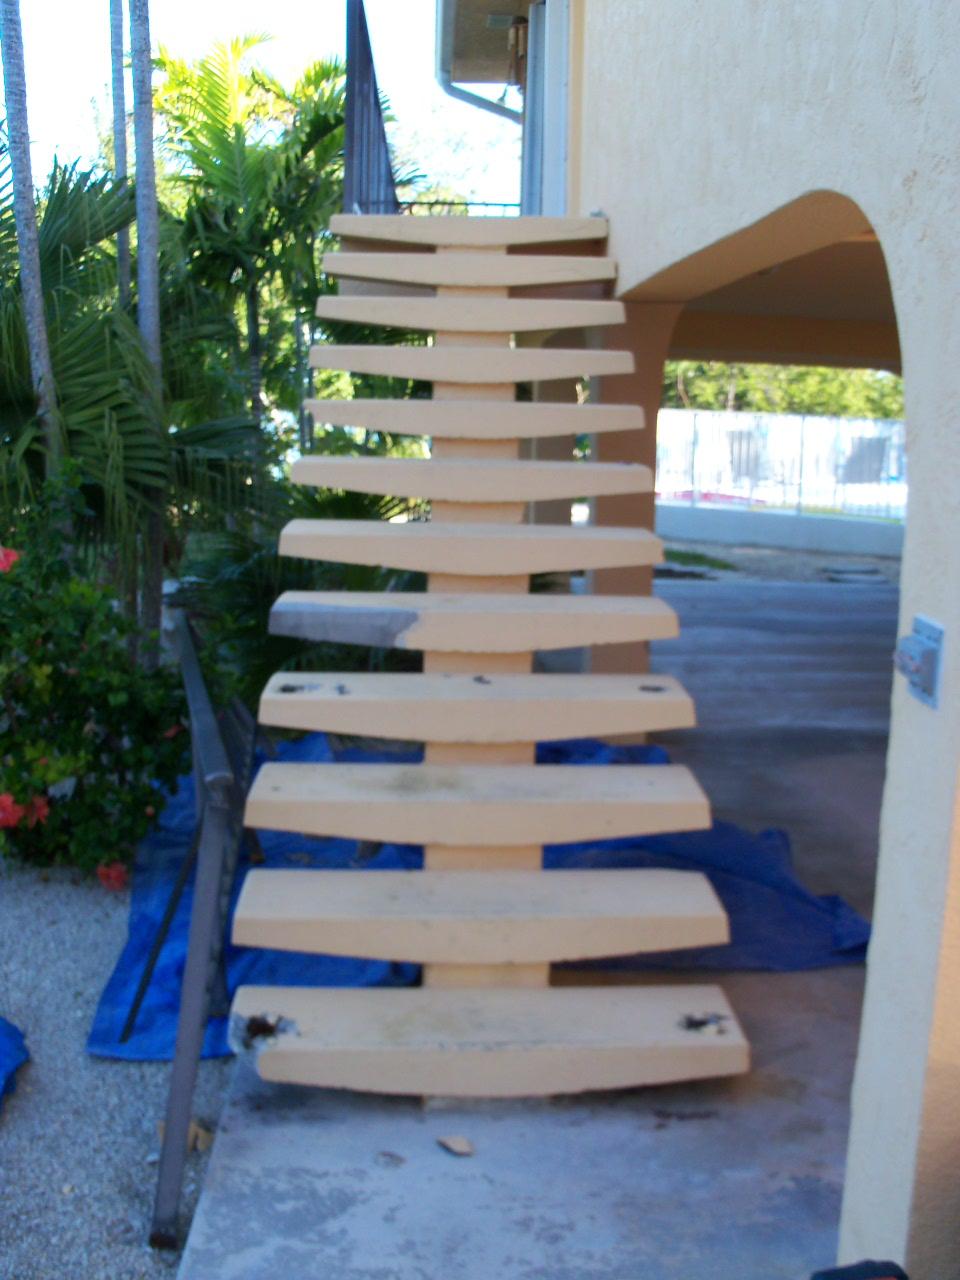 Ed sims development concrete stair repair - Resurfacing exterior concrete stairs ...